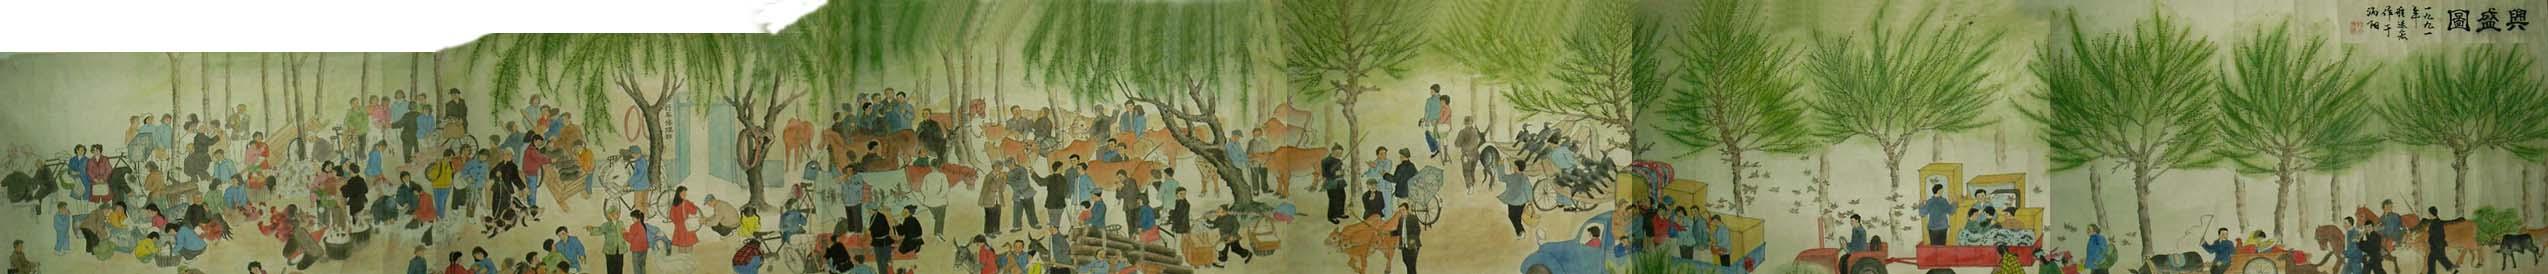 http://www.chengyuanhong.com/all/xingshengall.jpg